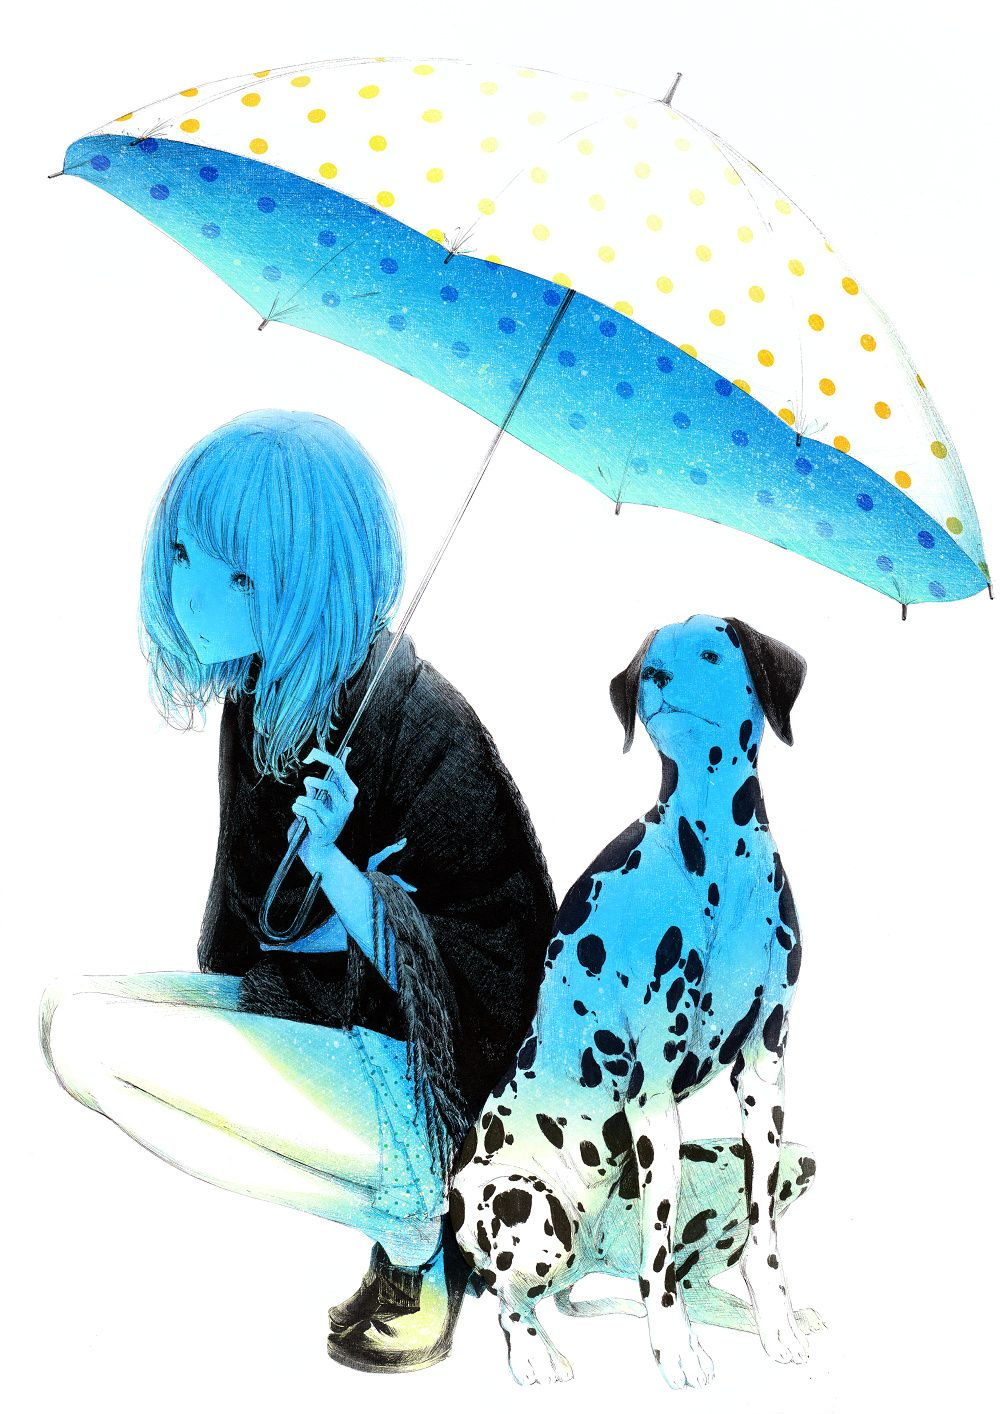 Pin by nataliechan on anime pinterest umbrellas manga